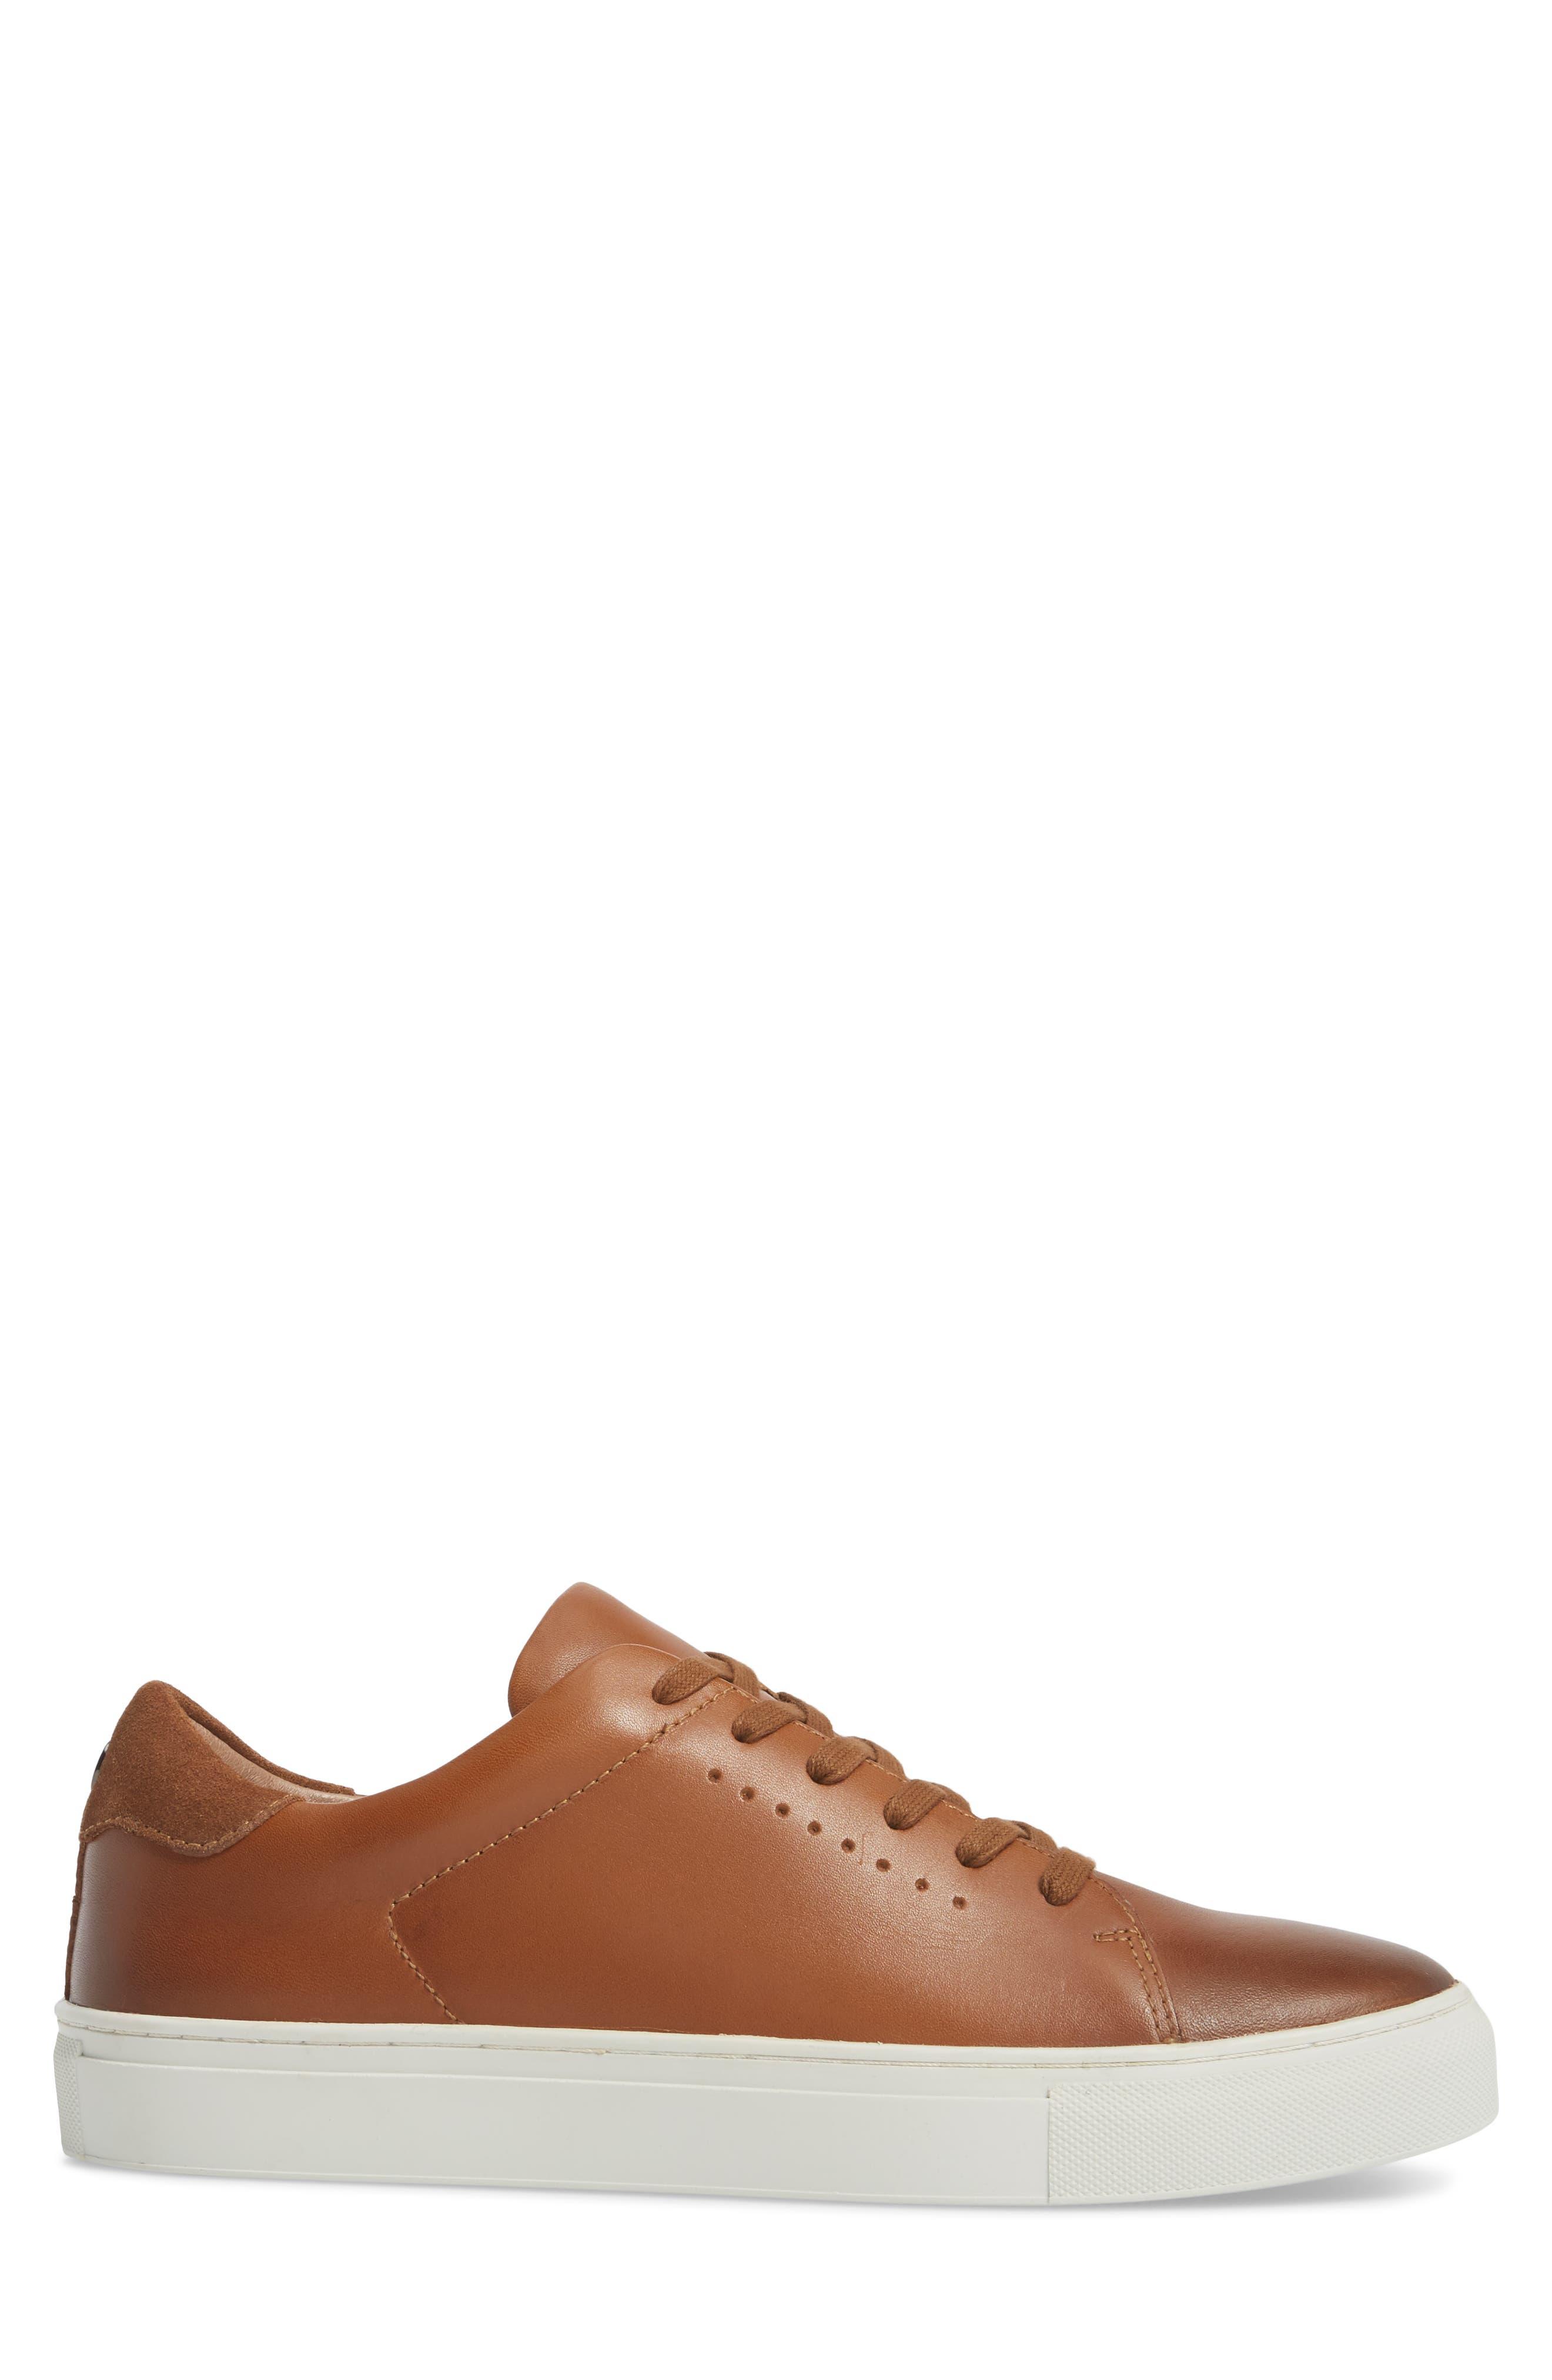 Desmond Sneaker,                             Alternate thumbnail 3, color,                             Tan Leather